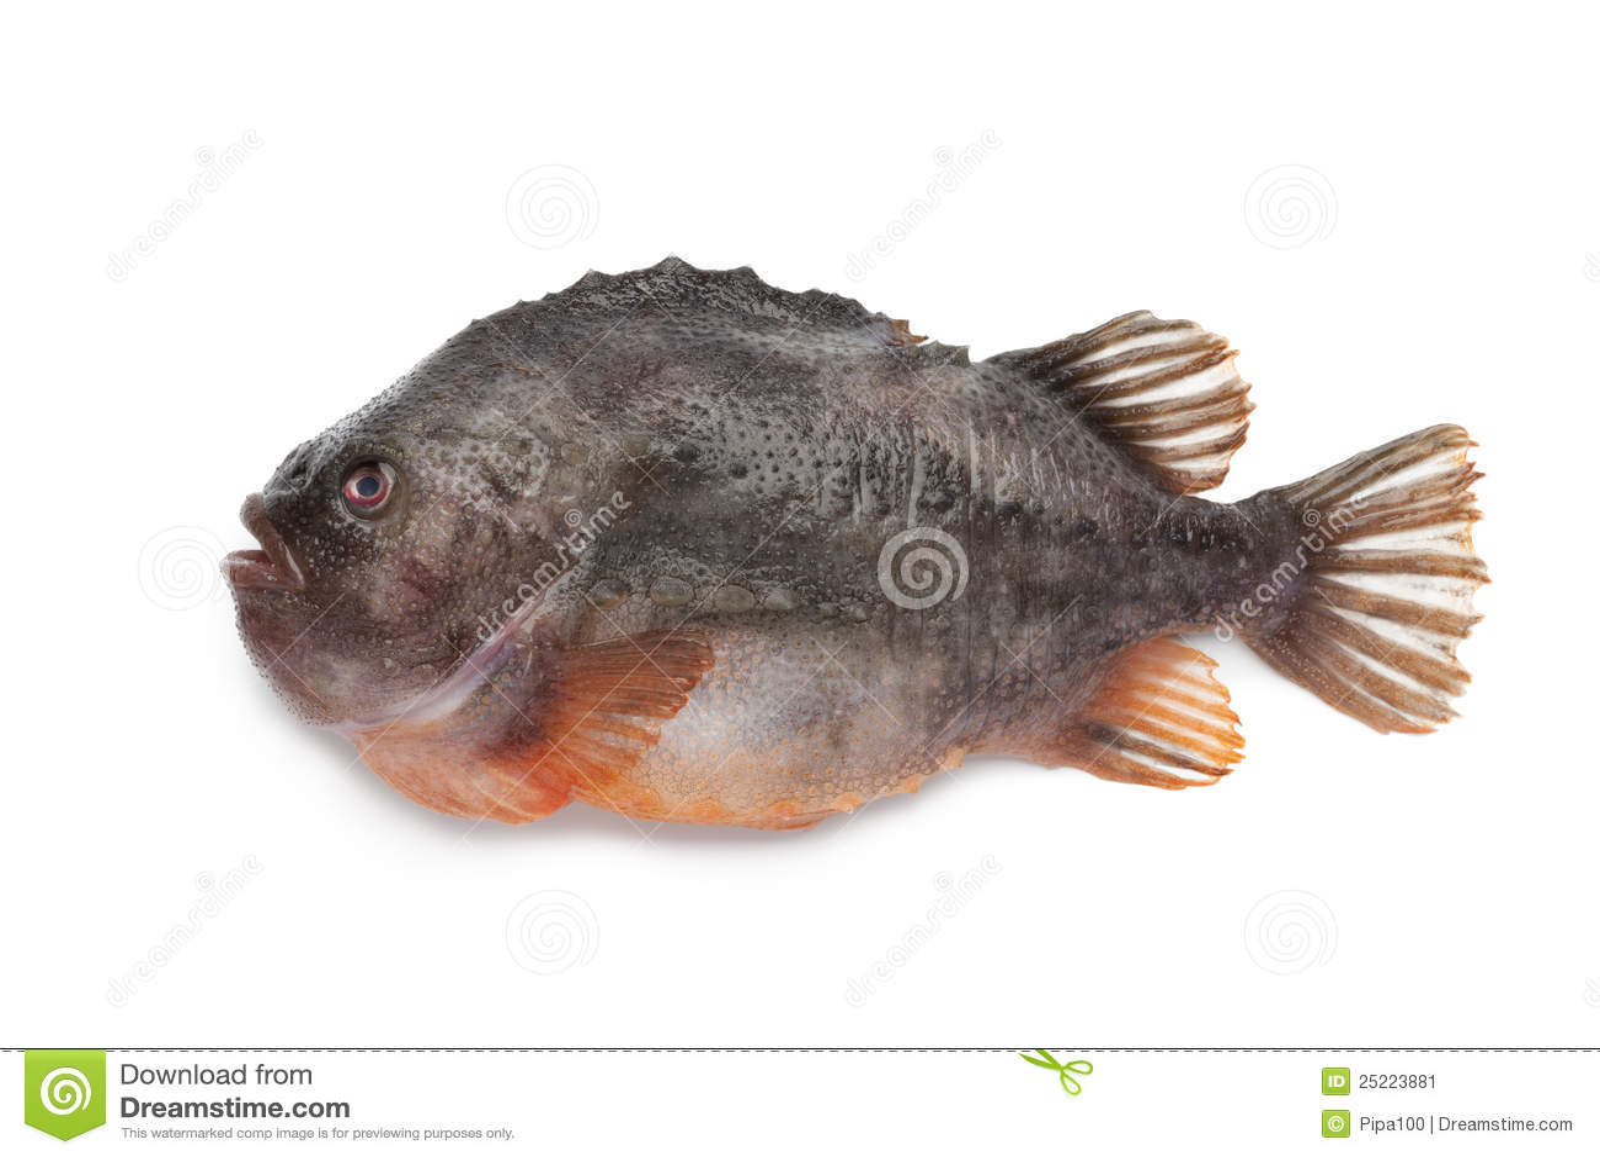 Lumpsucker fish